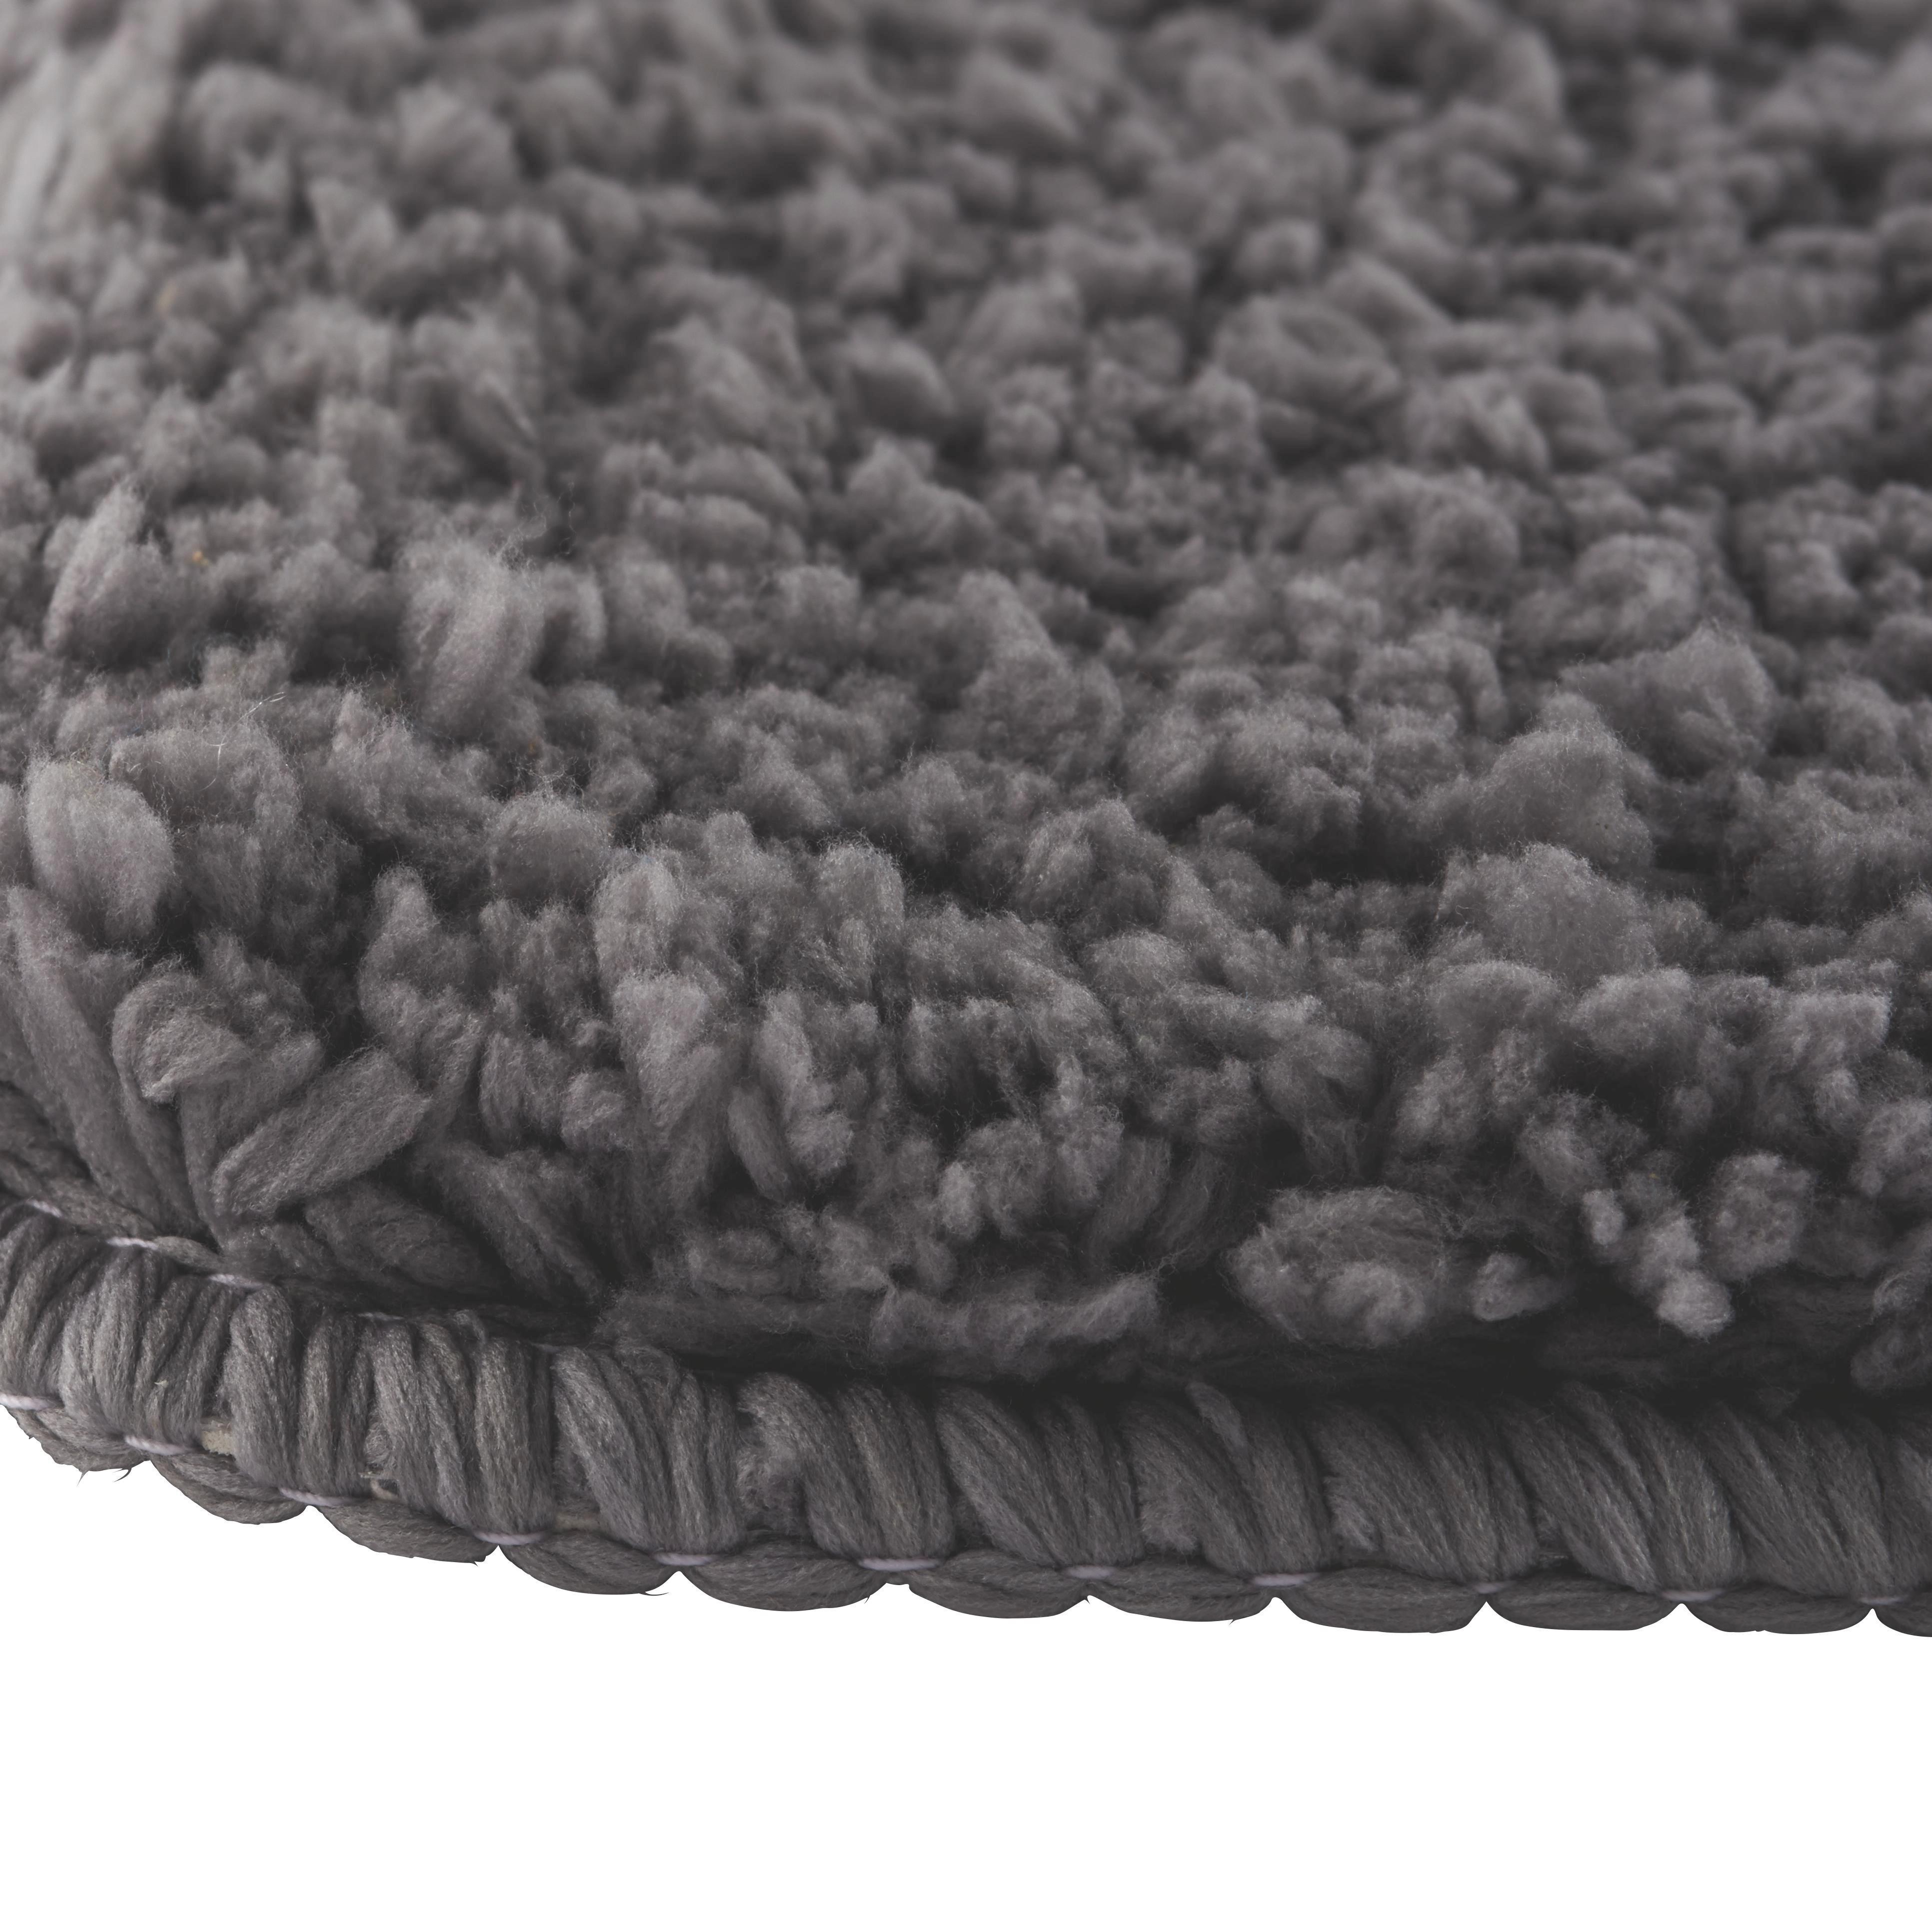 Badematte Christina ca. 60x90cm - Grau, Textil (60/90cm) - MÖMAX modern living